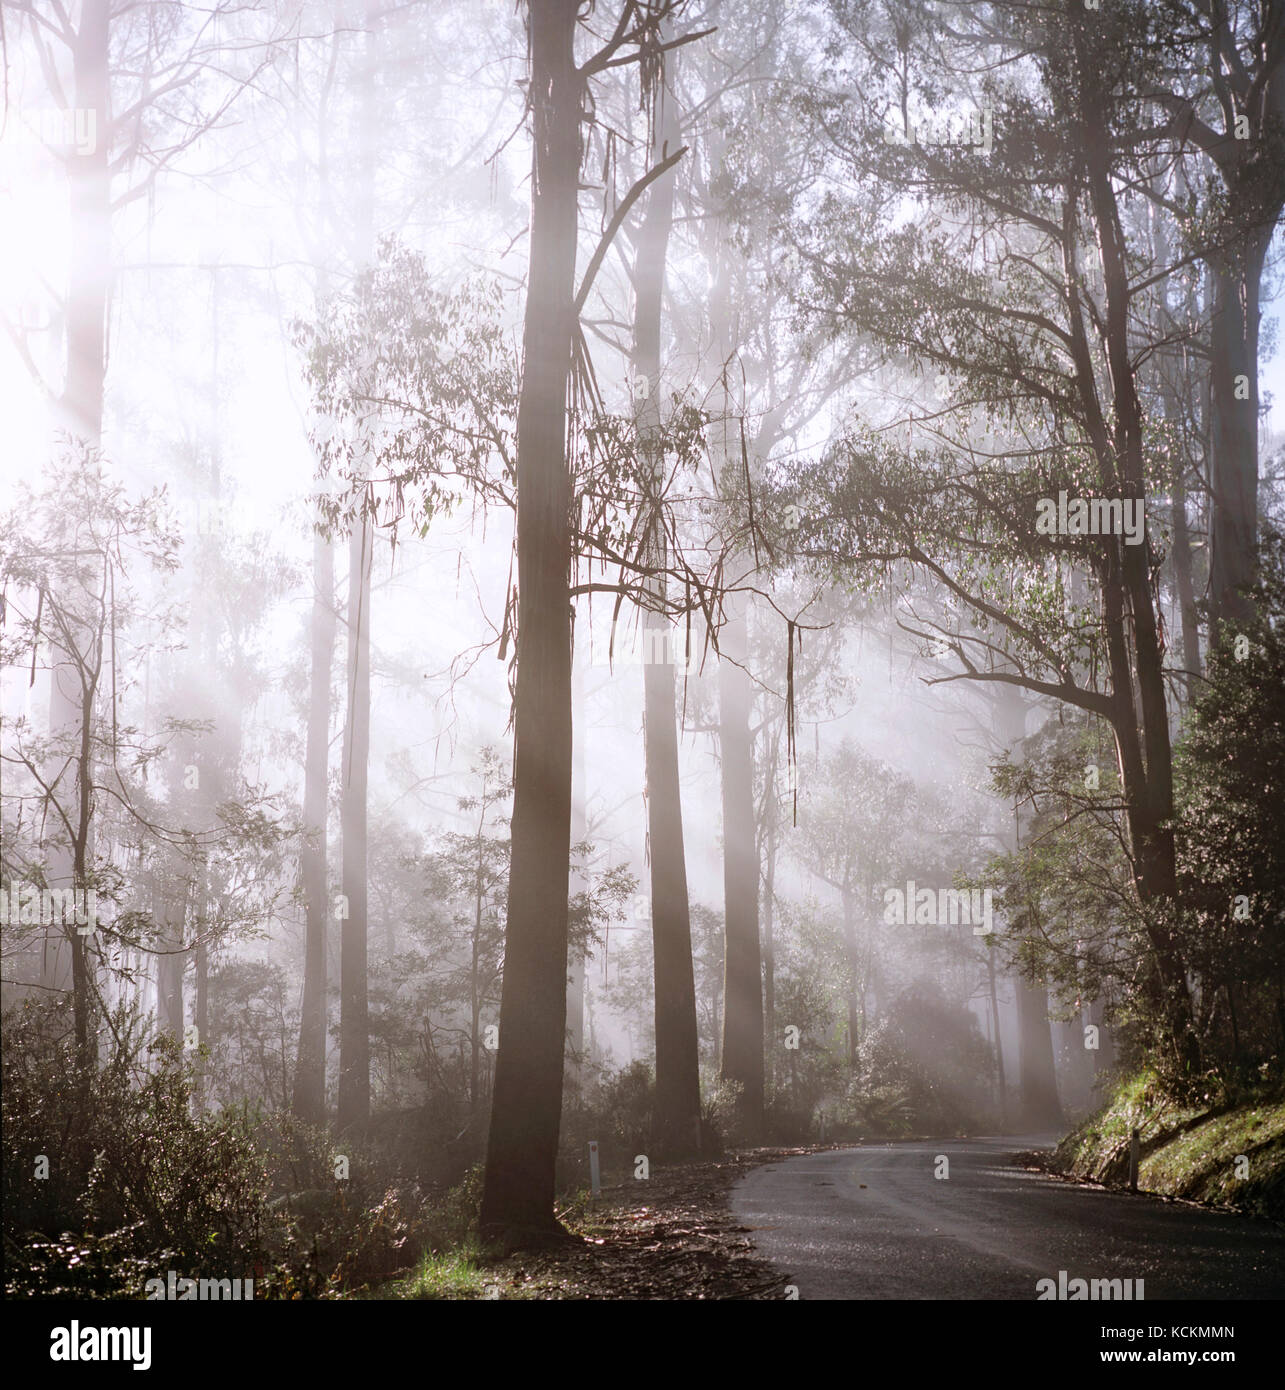 Mountain ash (Eucalyptus regnans), Yarra Ranges National Park, Victoria (east of Marysville), Australia - Stock Image